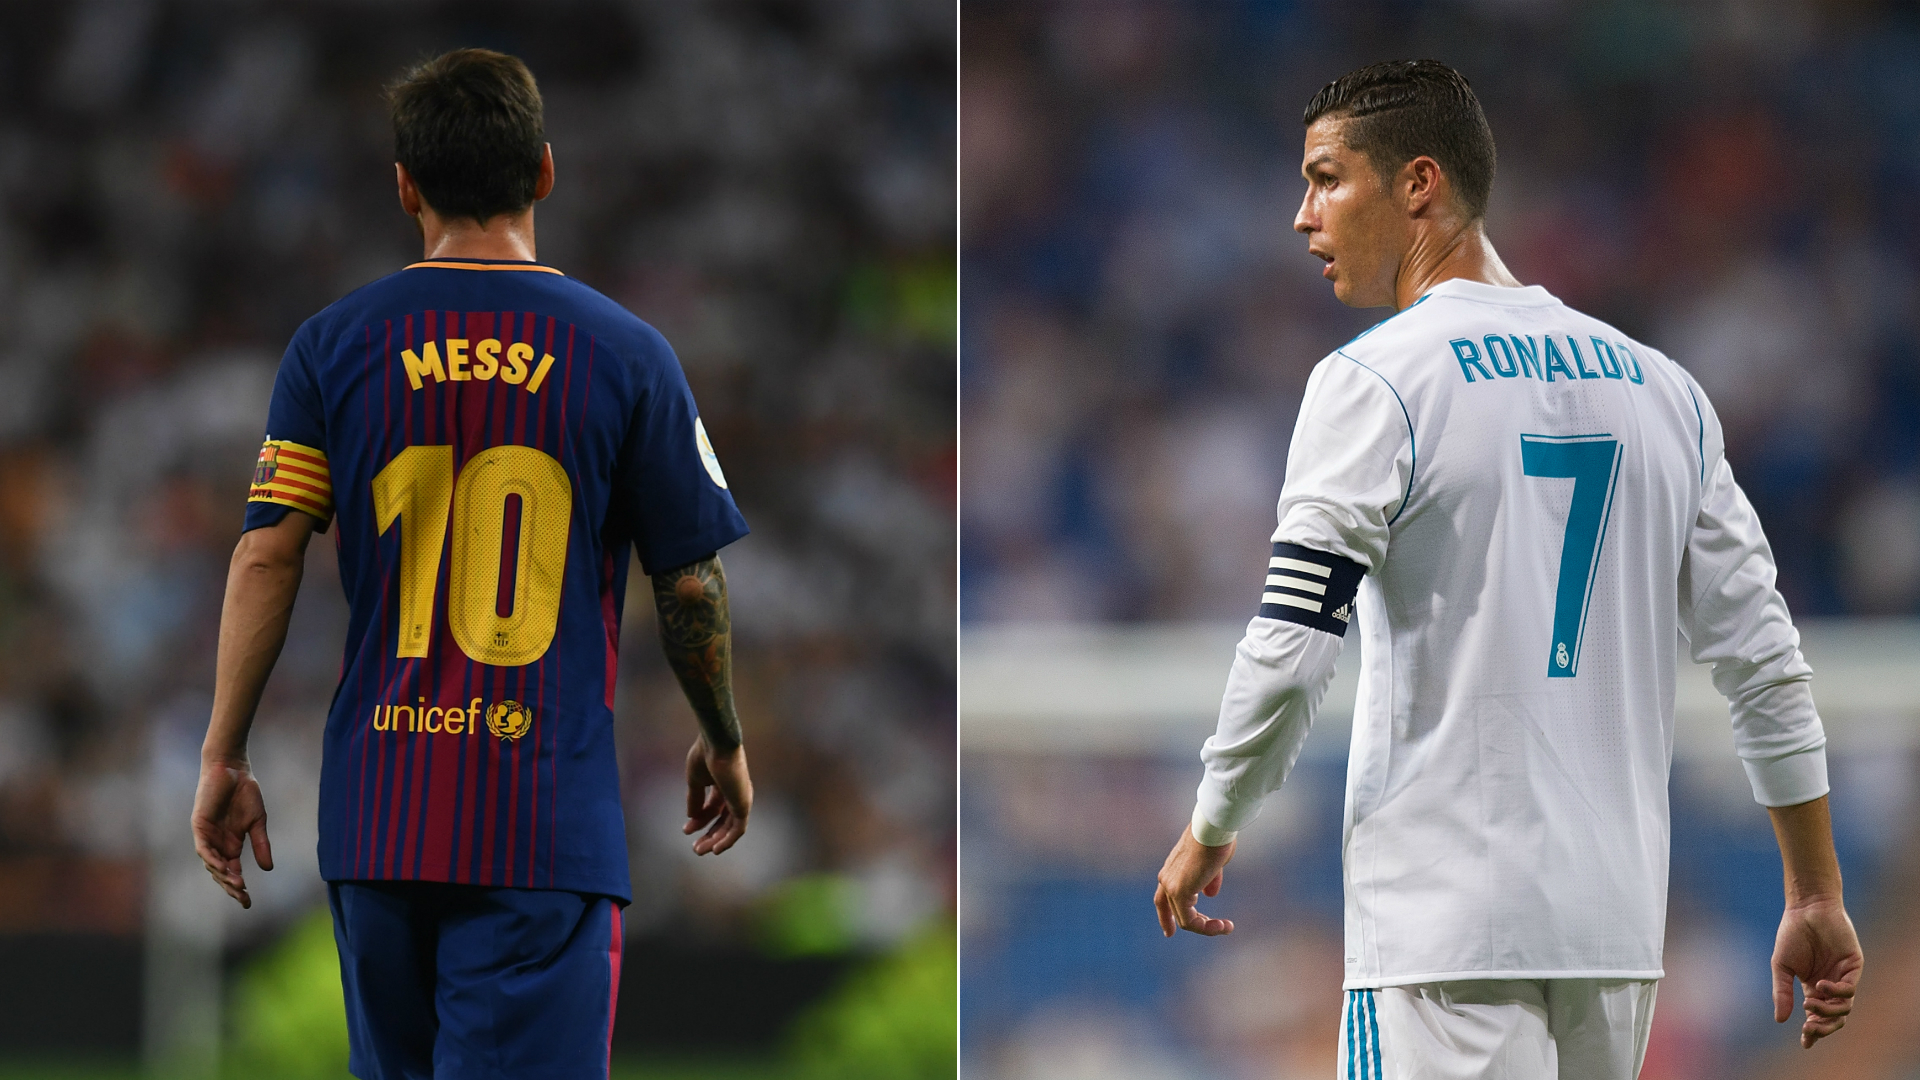 06.-Messi-y-Ronaldo-1.jpg